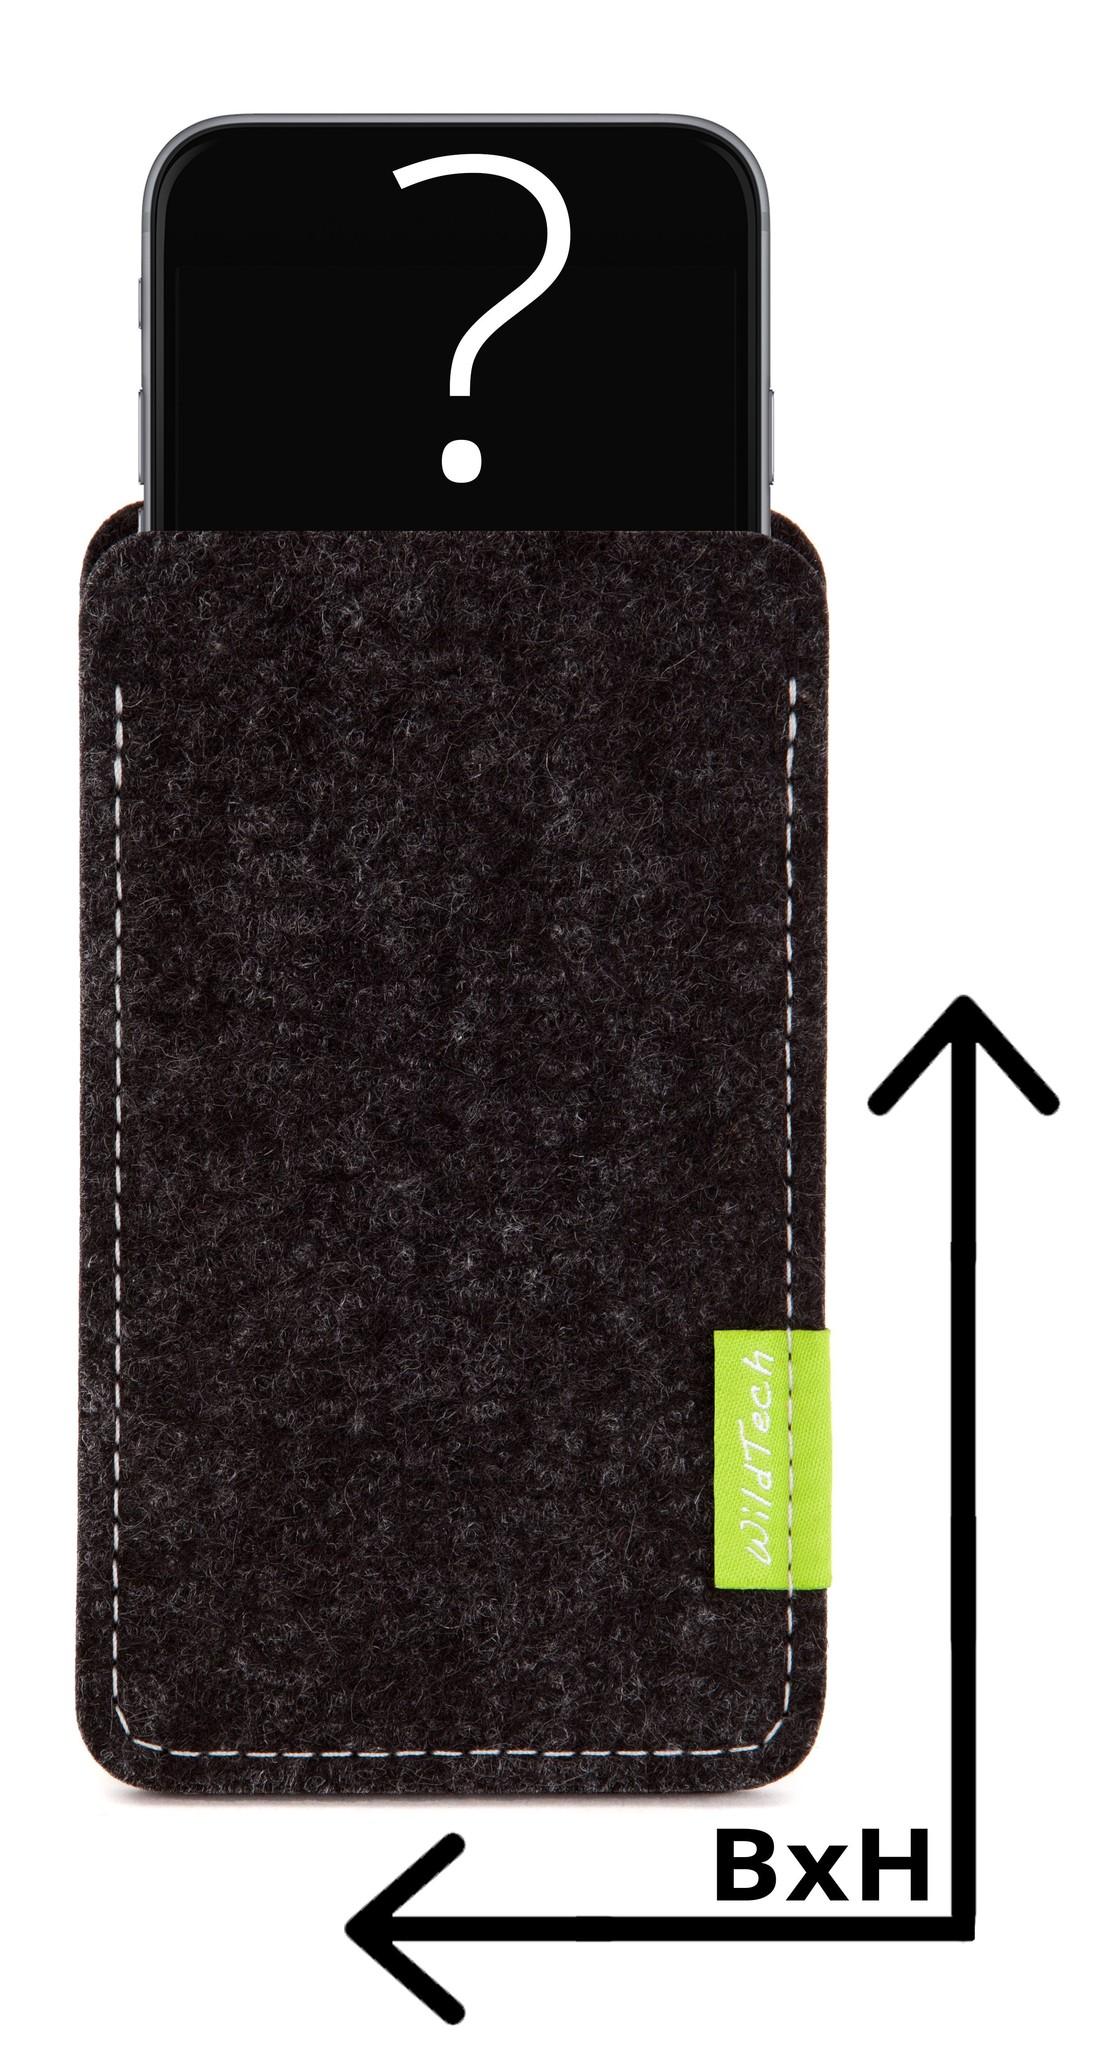 Individuelles Smartphone Sleeve Anthrazit-1